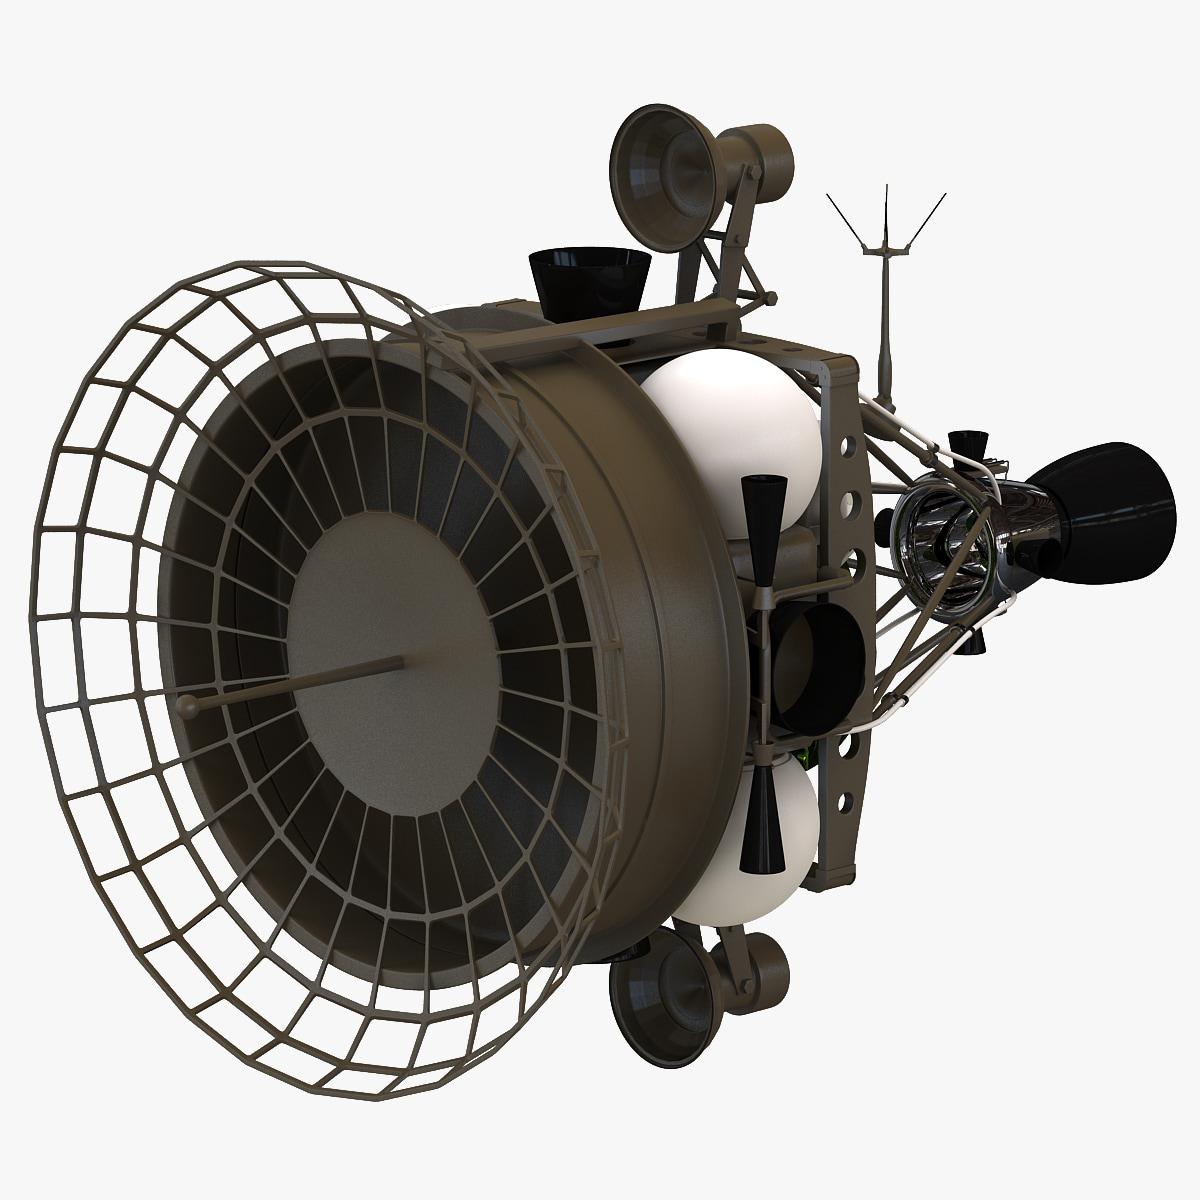 Military_Anti-Satellite_System_Target_Satellite_000.jpg